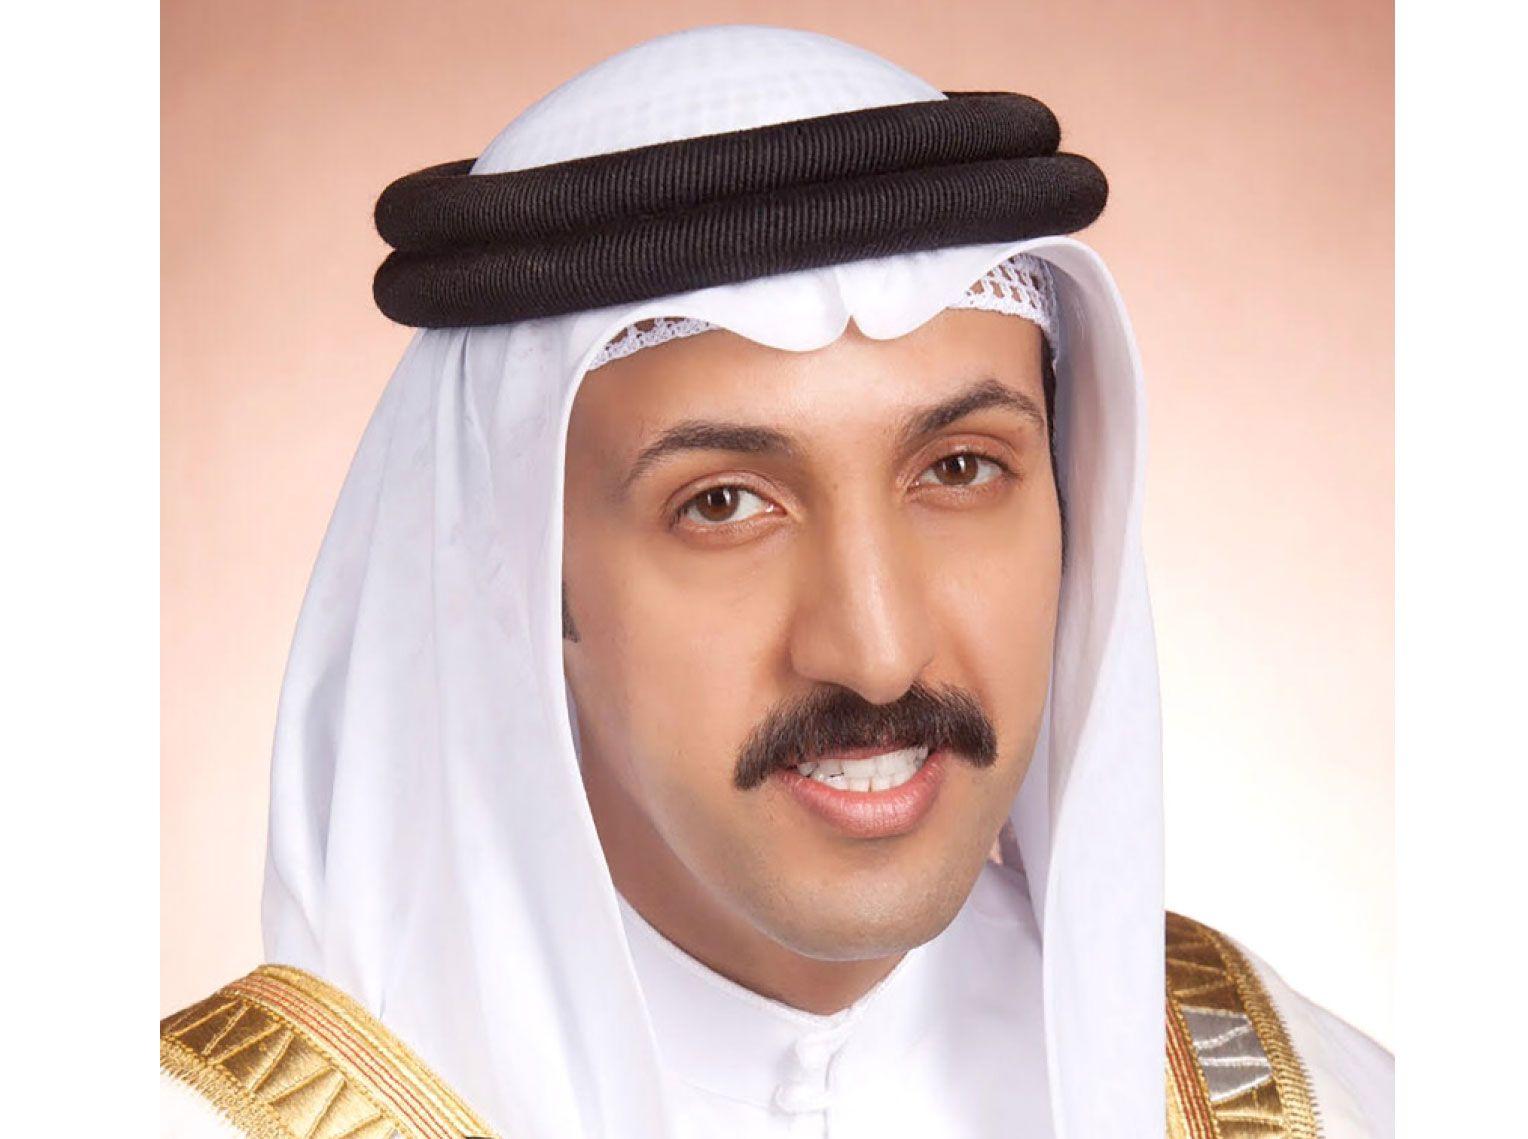 البحرين: قطر كعادتها نقضت تعهداتها